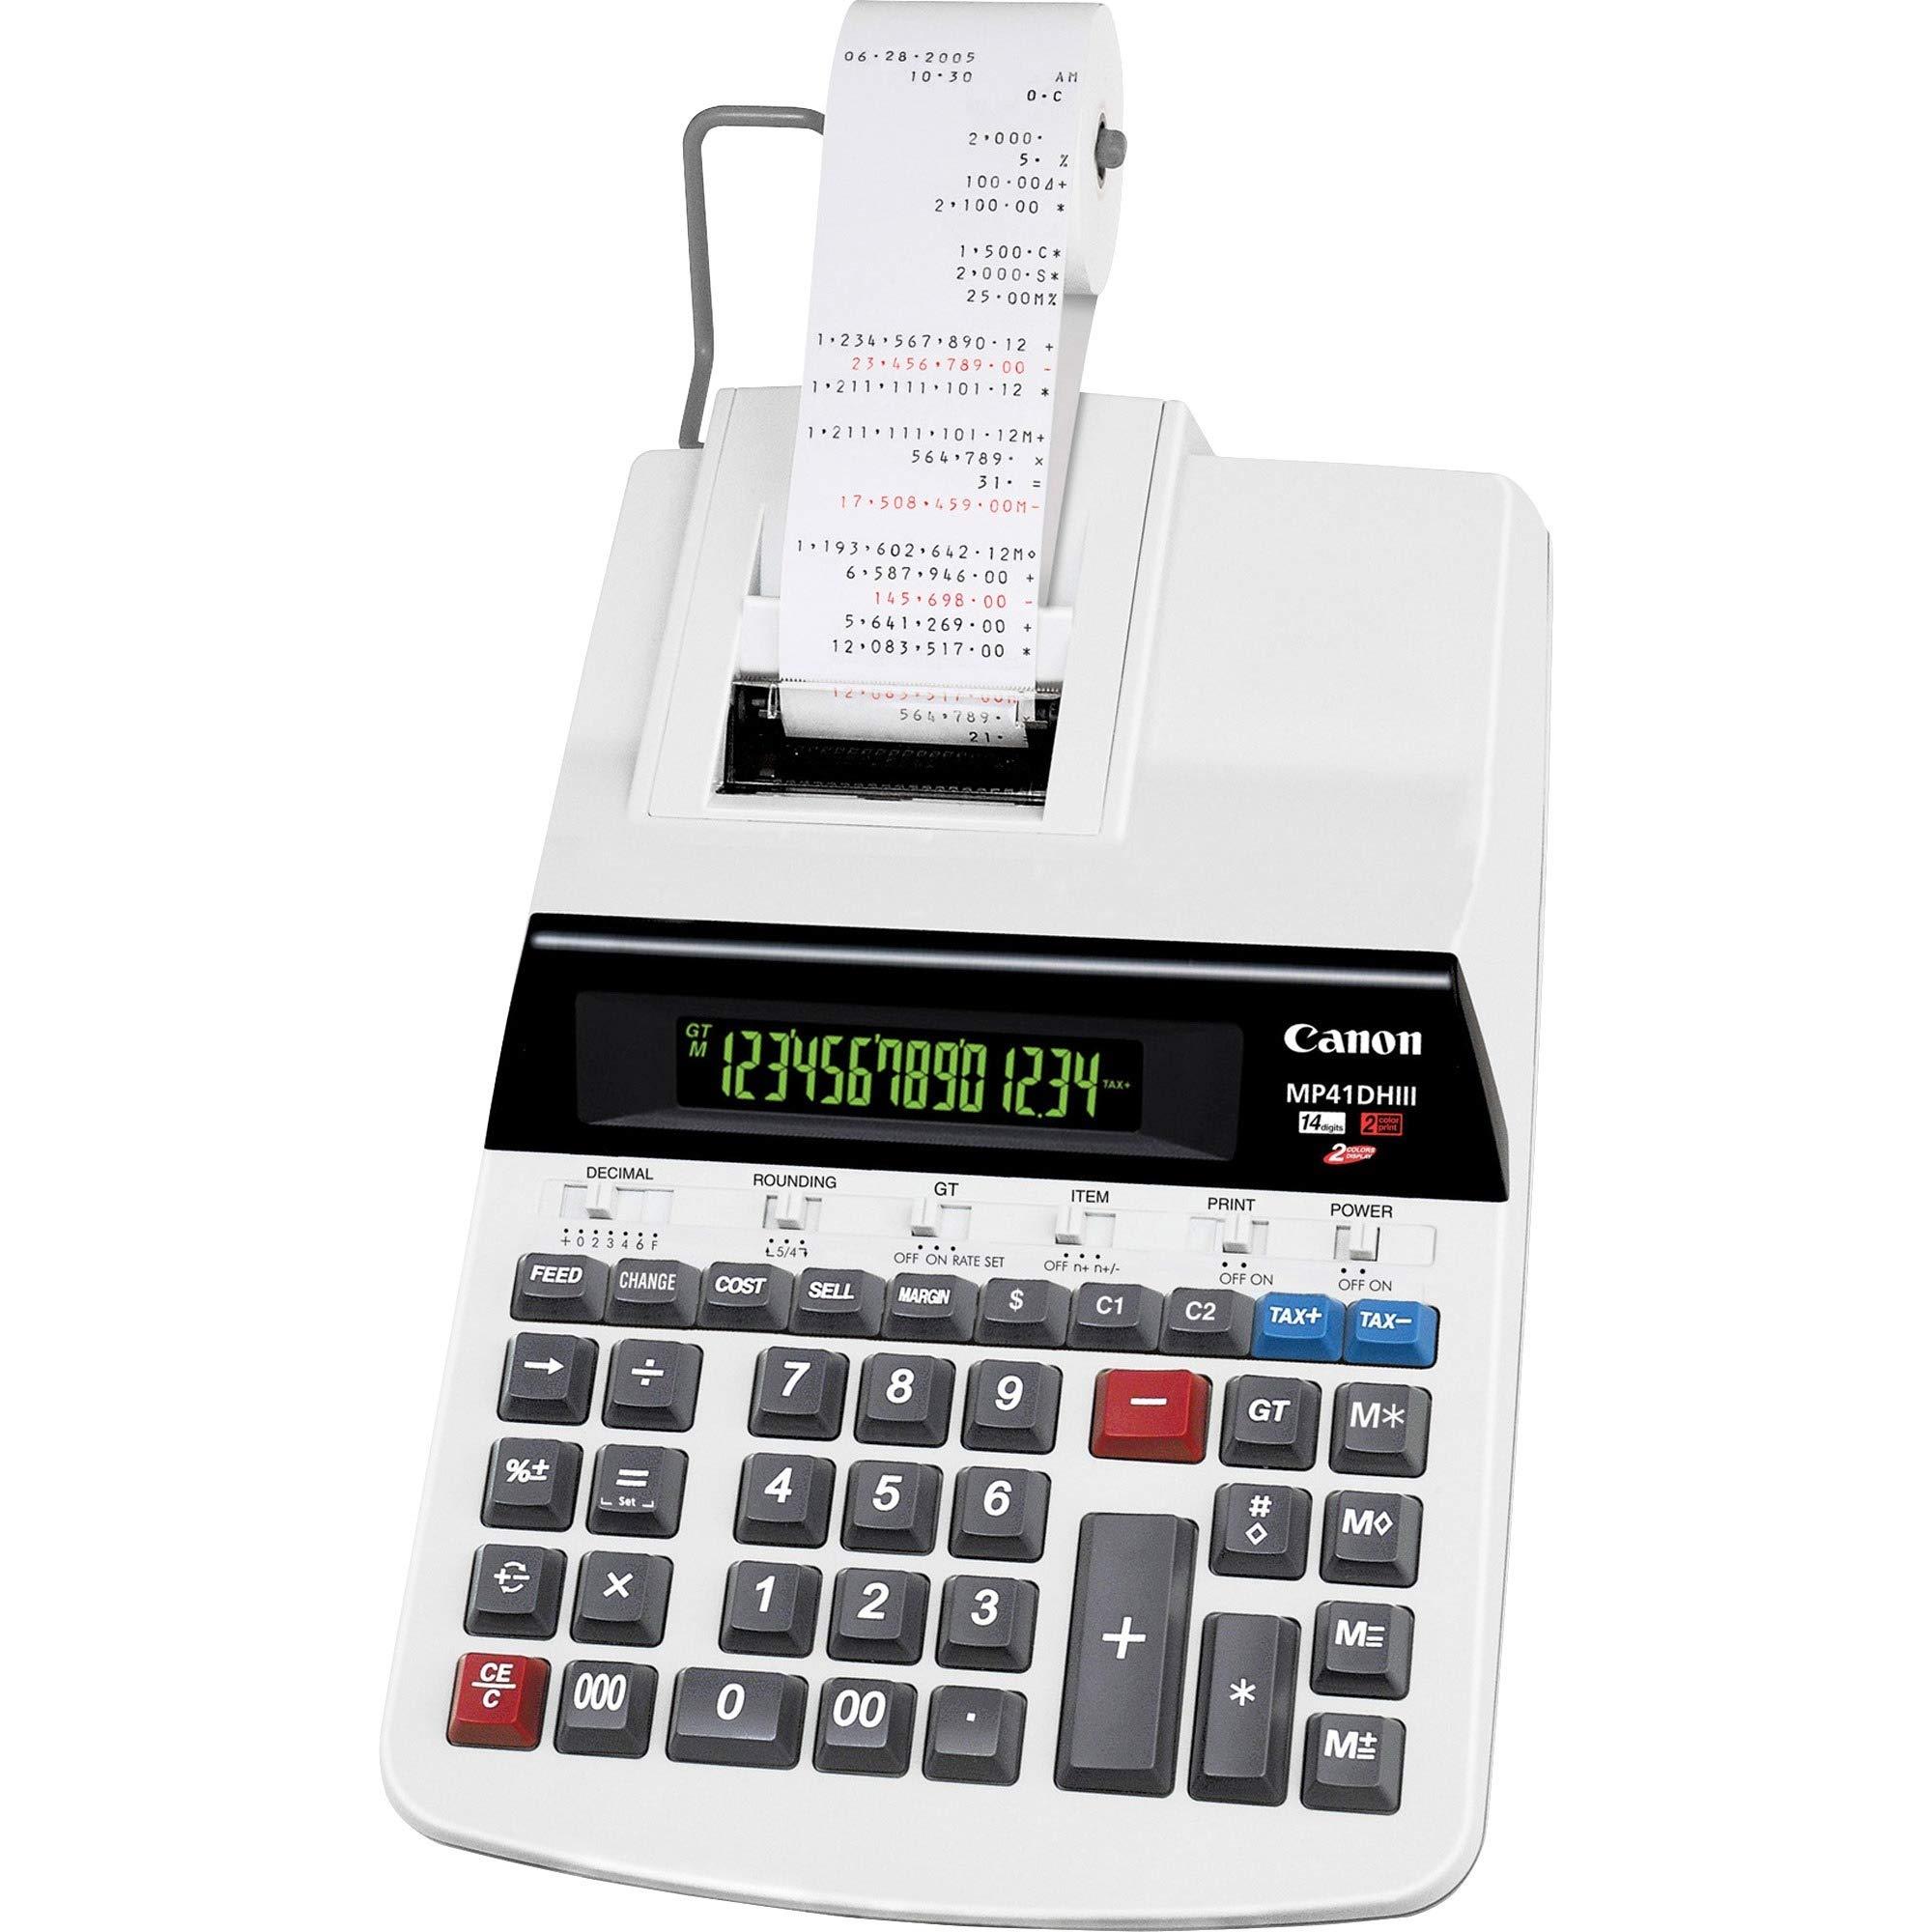 Canon MP41DHIII Printing Calculator 14-Digit 9''x14''x3-1/4'' Gray